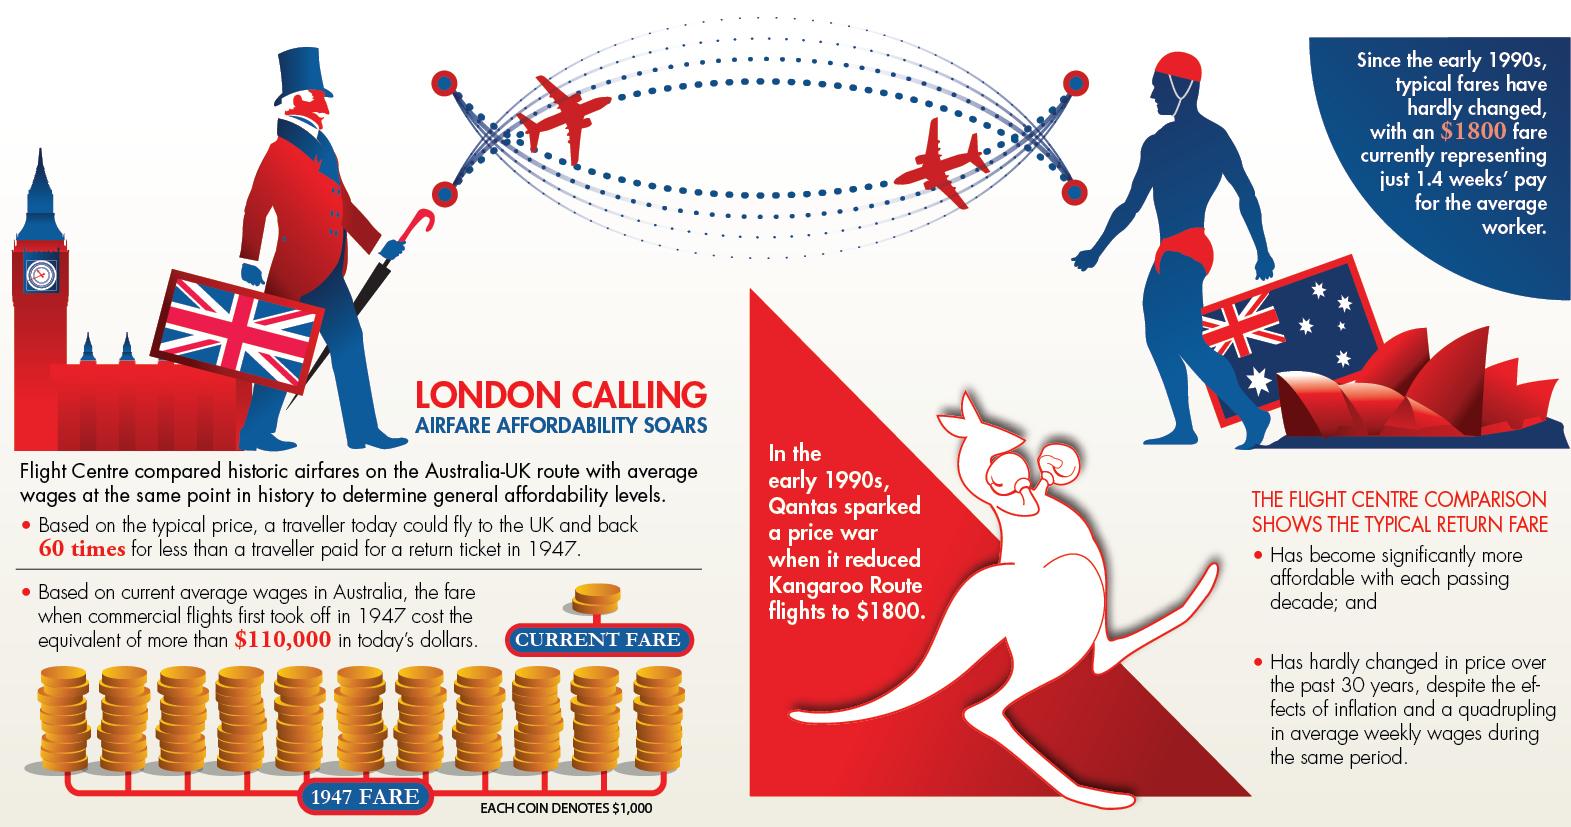 LondoncallingFinal.jpg